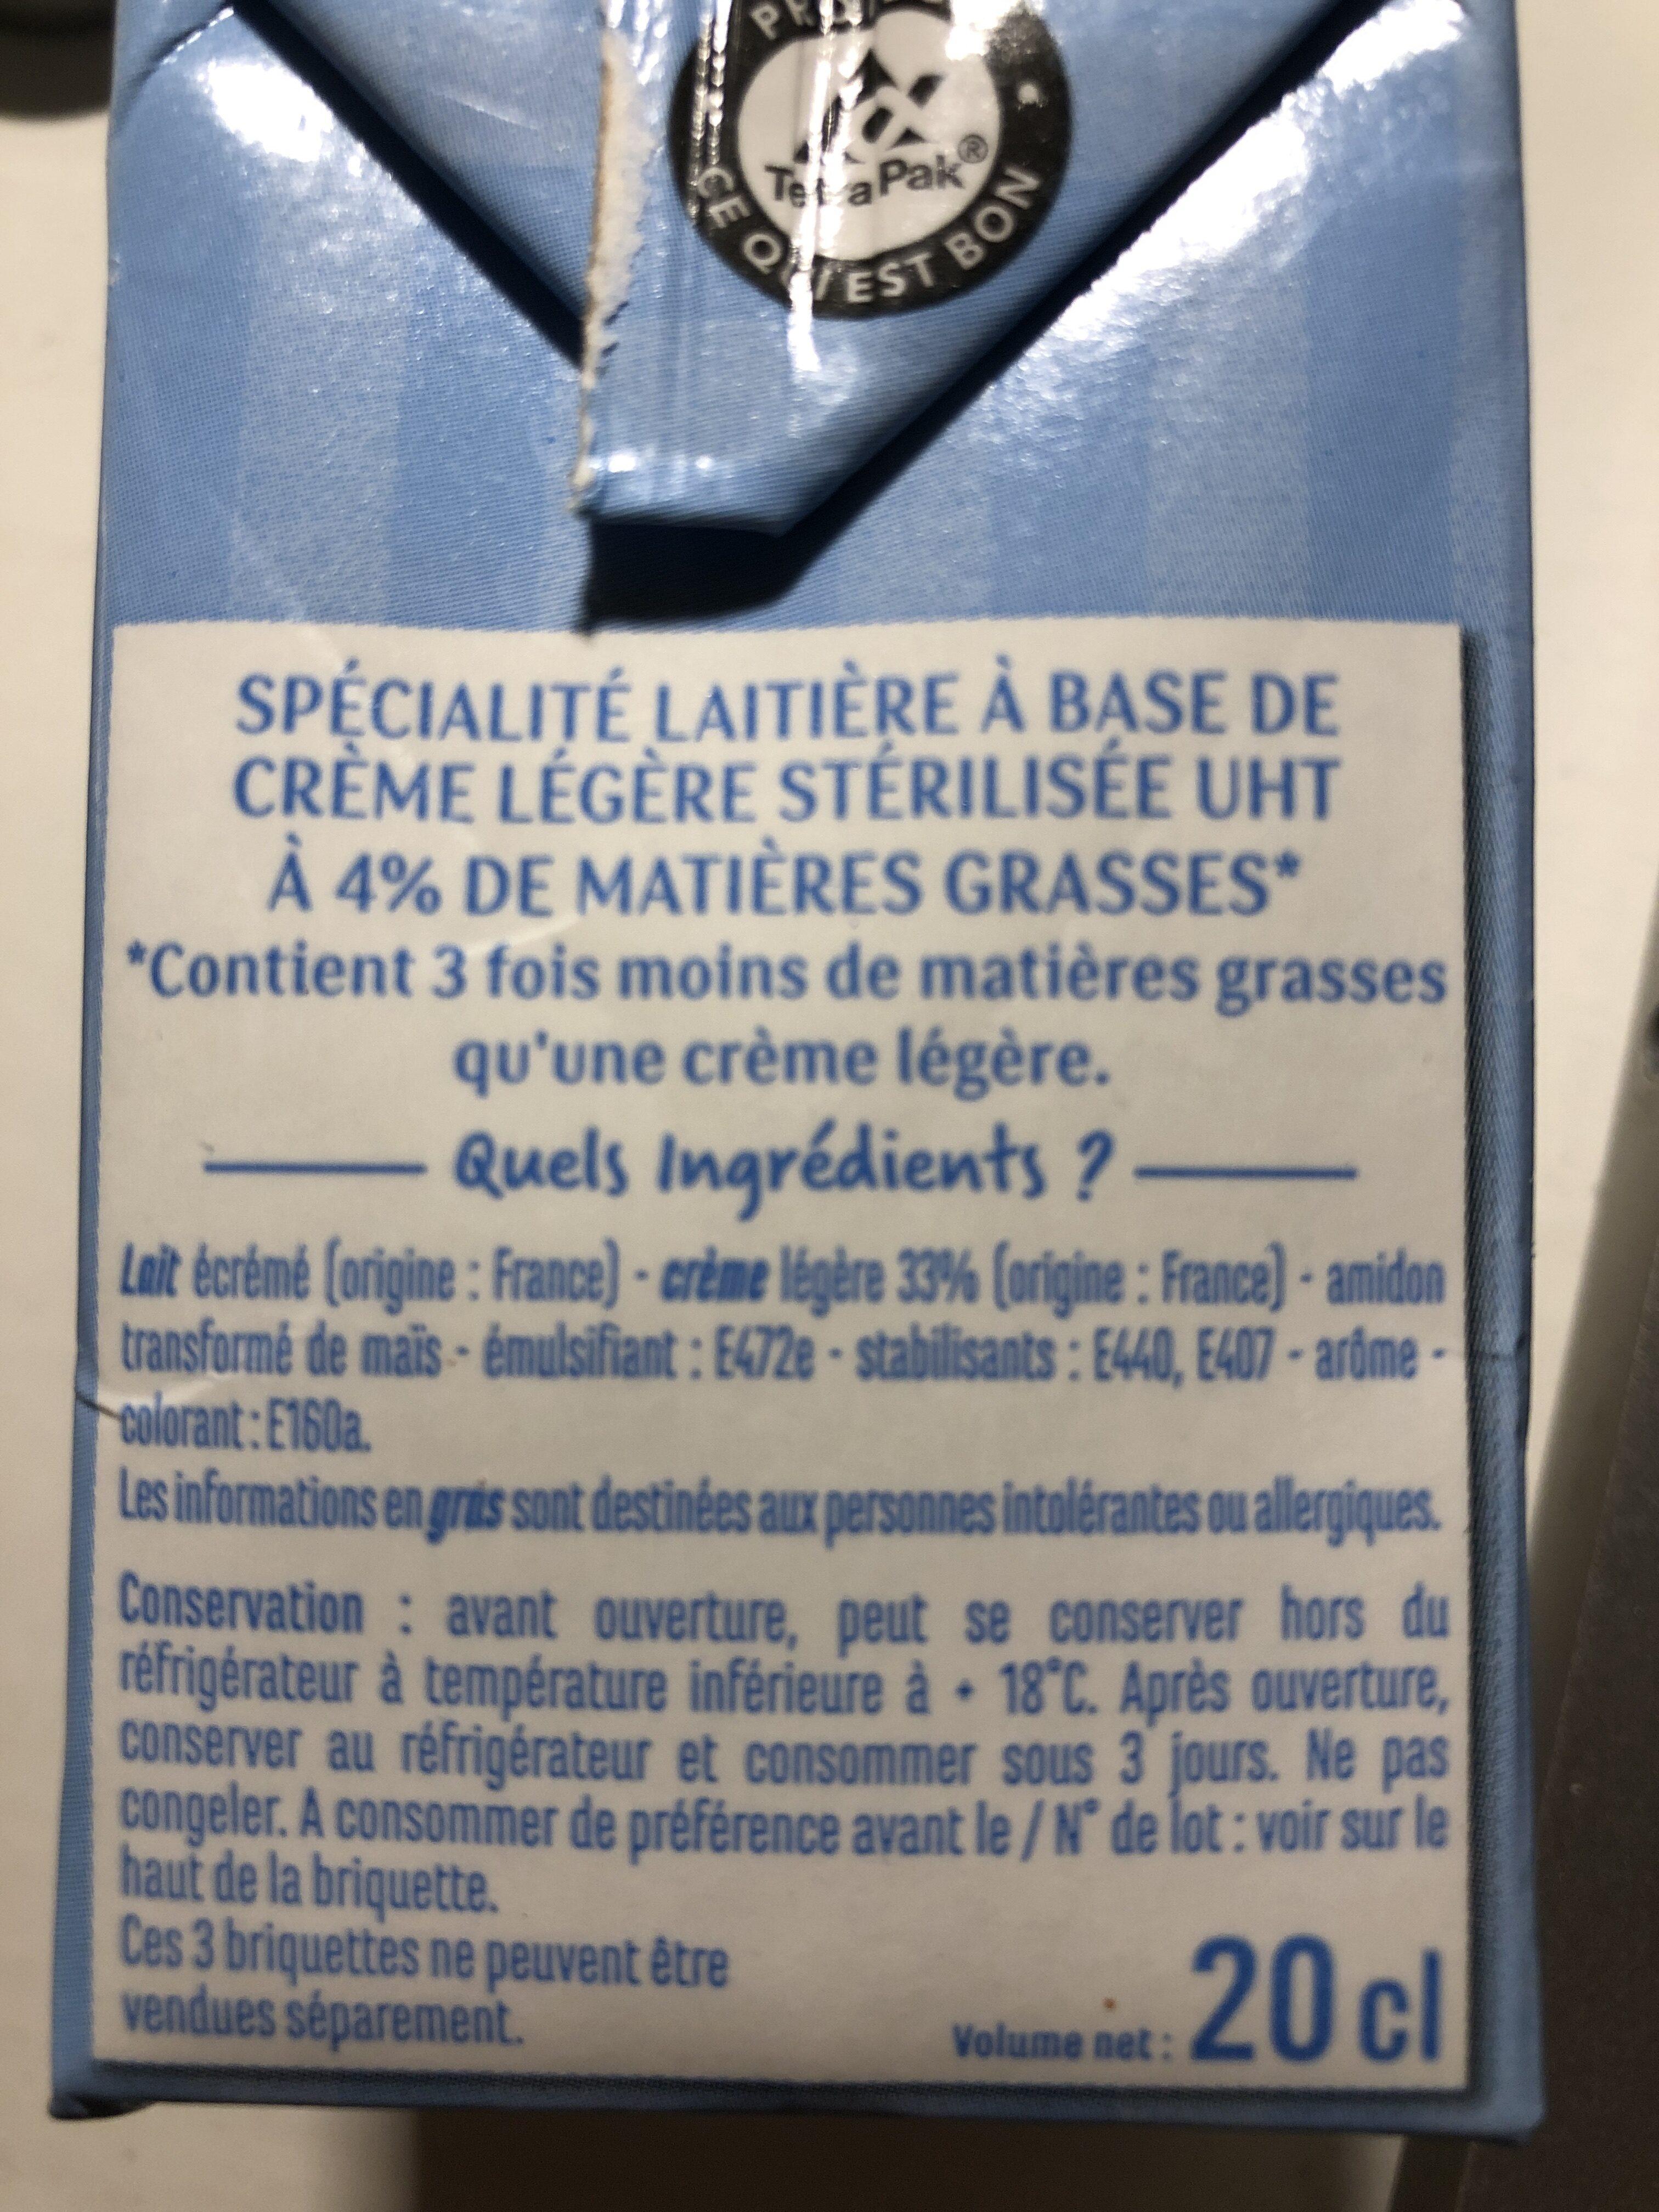 Crème légère 4% - Ingrediënten - fr